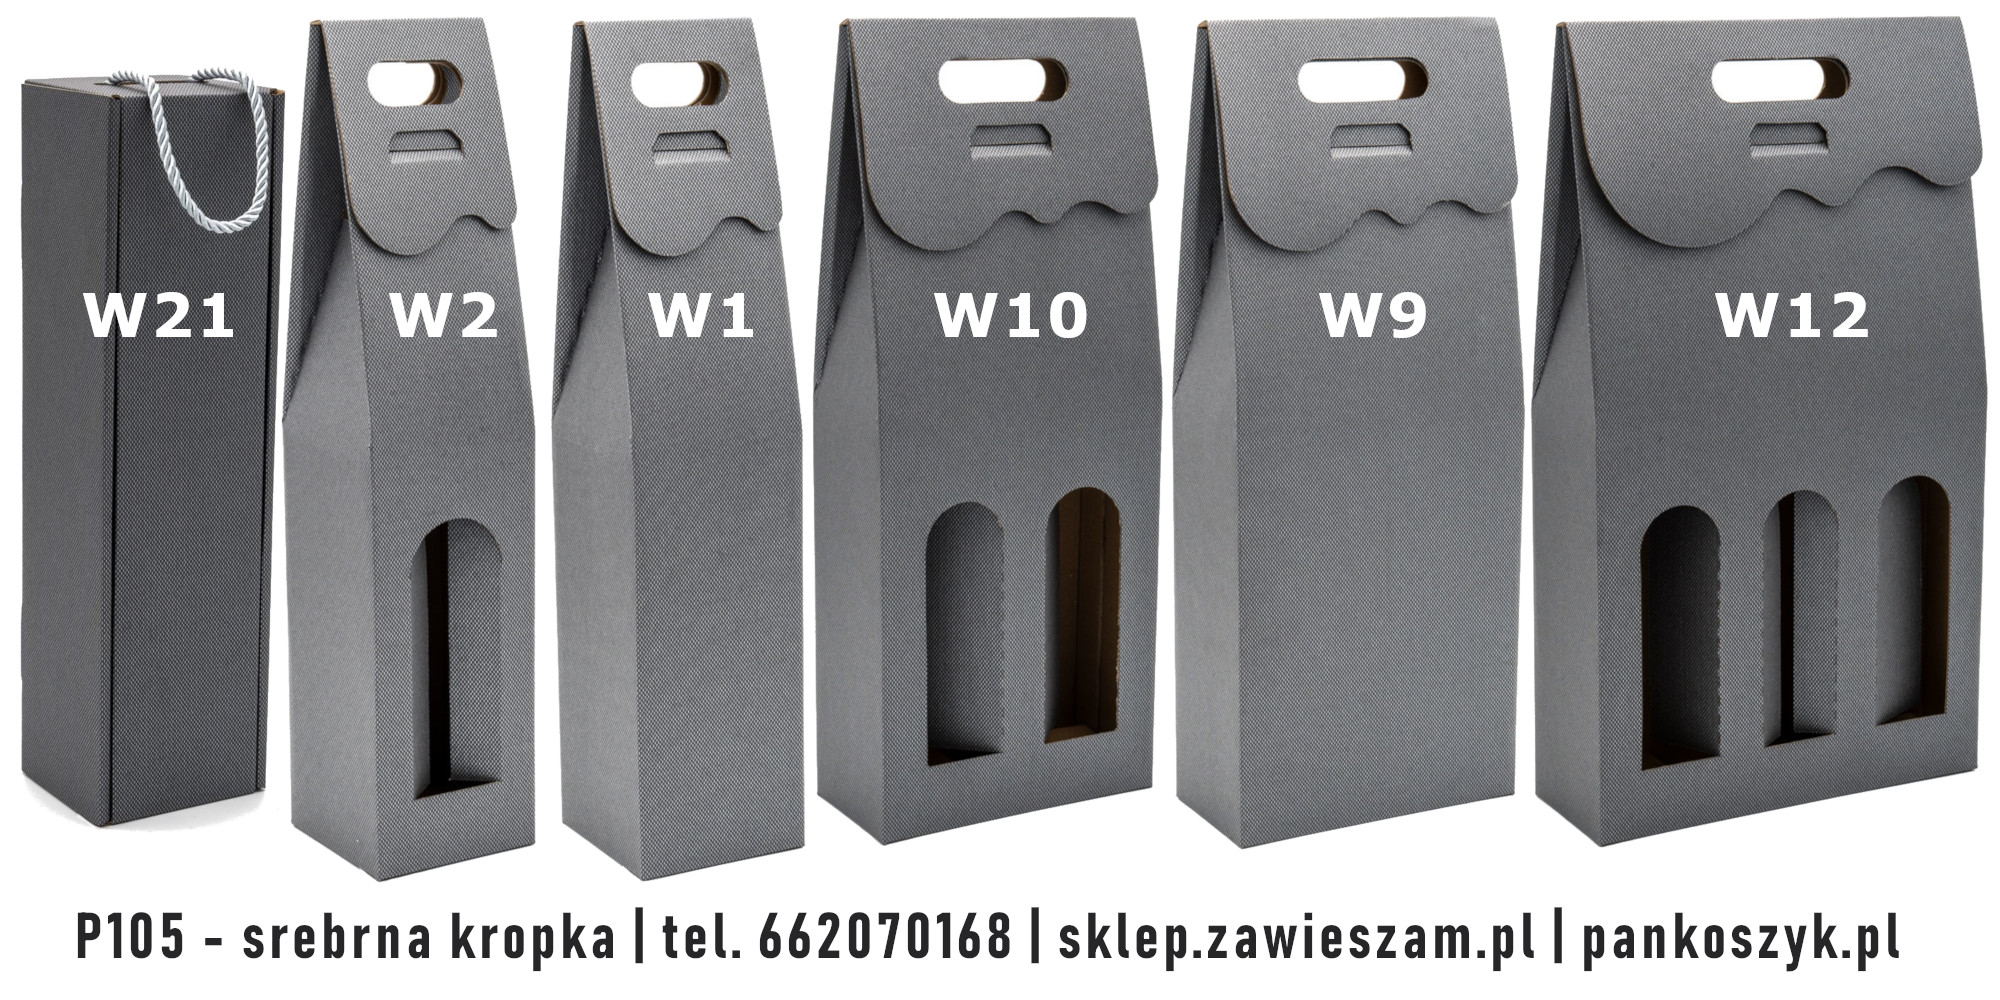 Kolorowe pudełko na butelki P105 - srebrna kropka